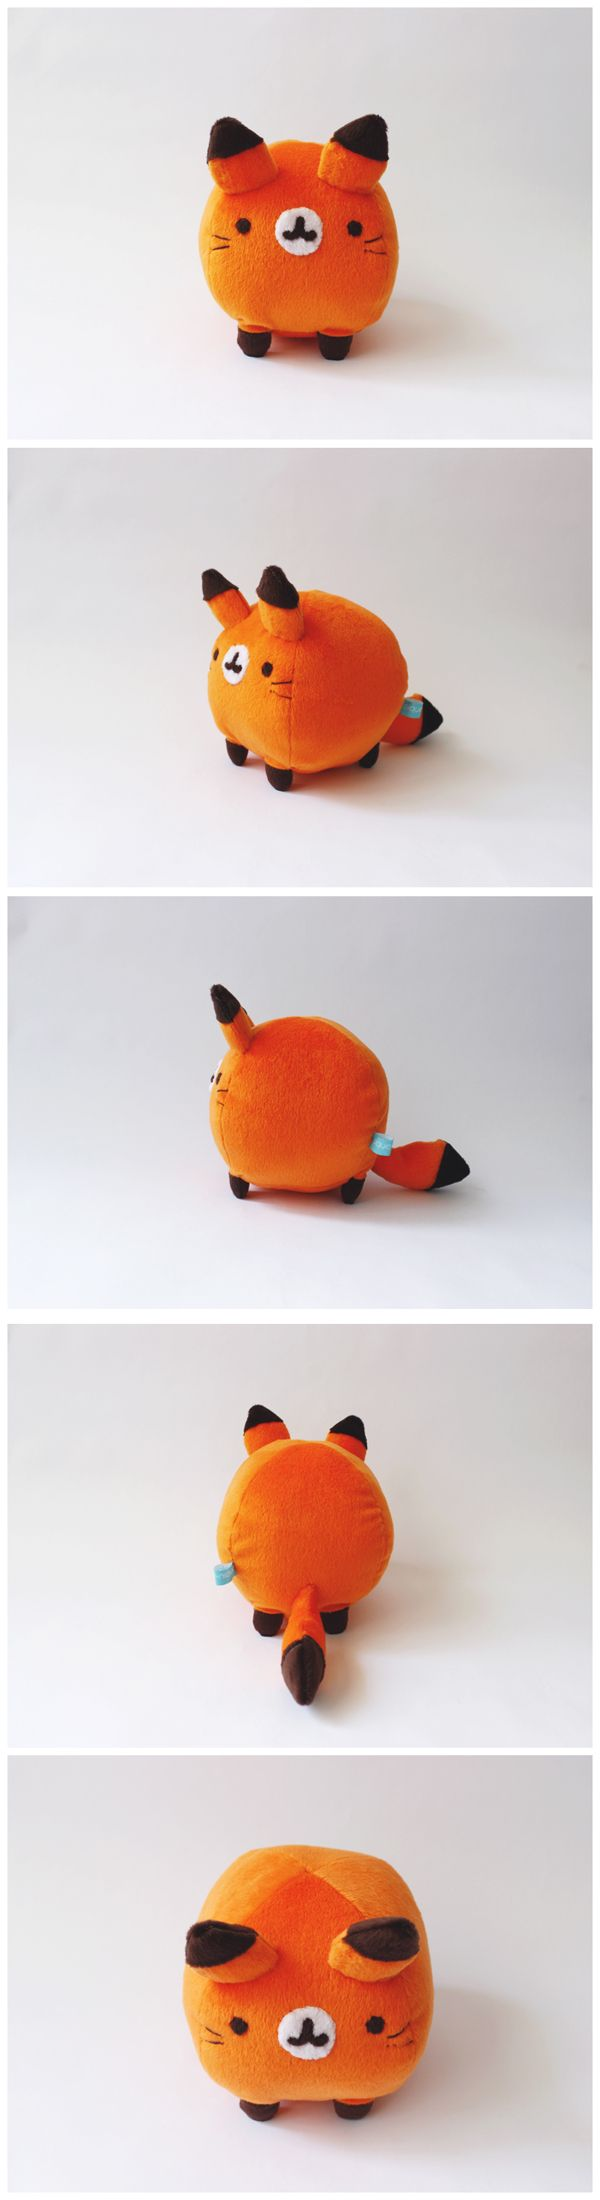 pique-nique / mini bolas 3 on Behance